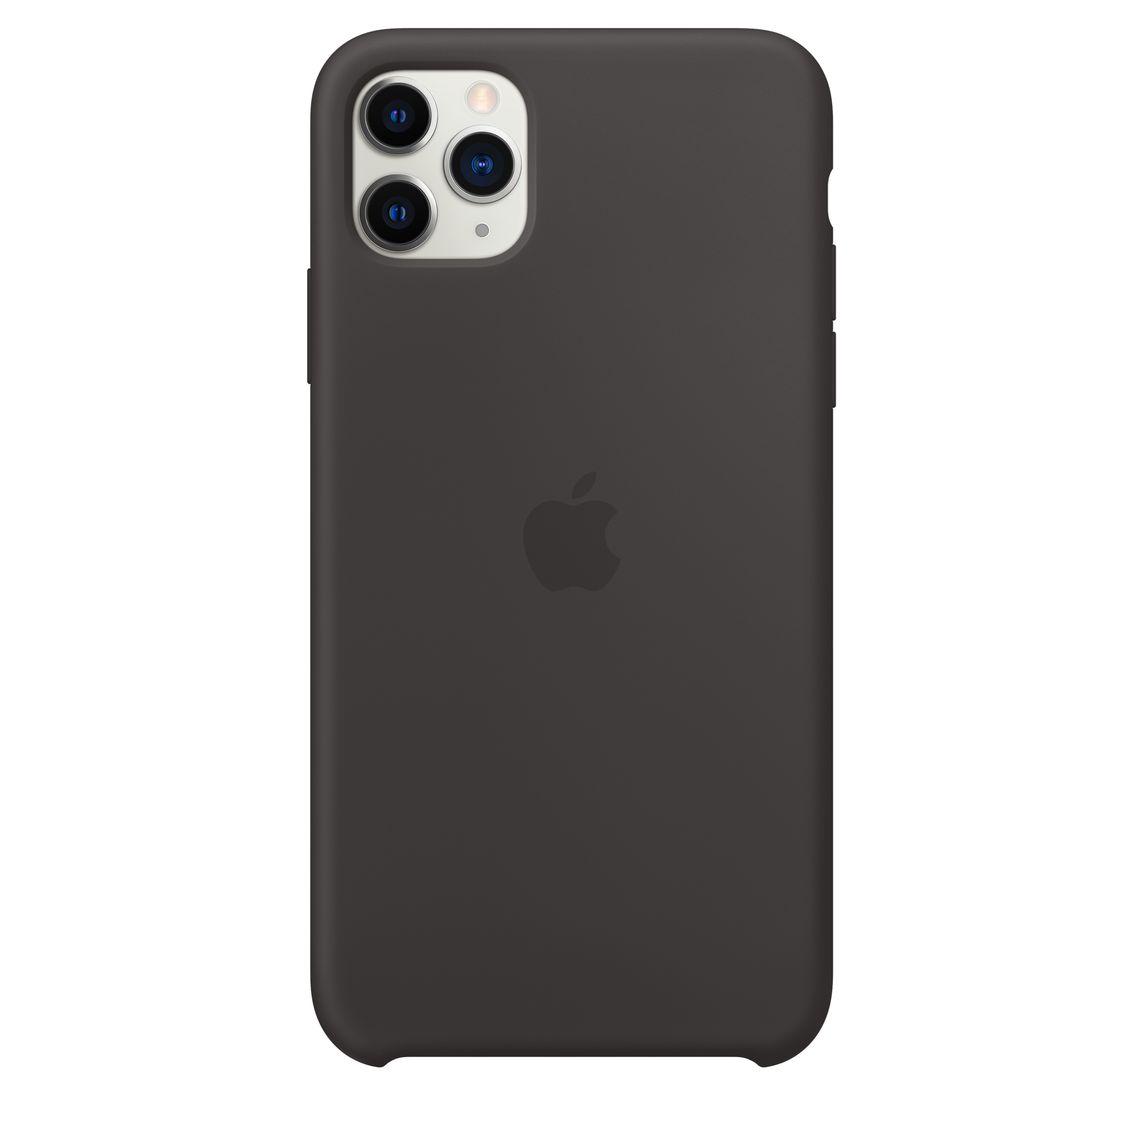 Iphone 11 Pro Max Silicone Case Black Apple